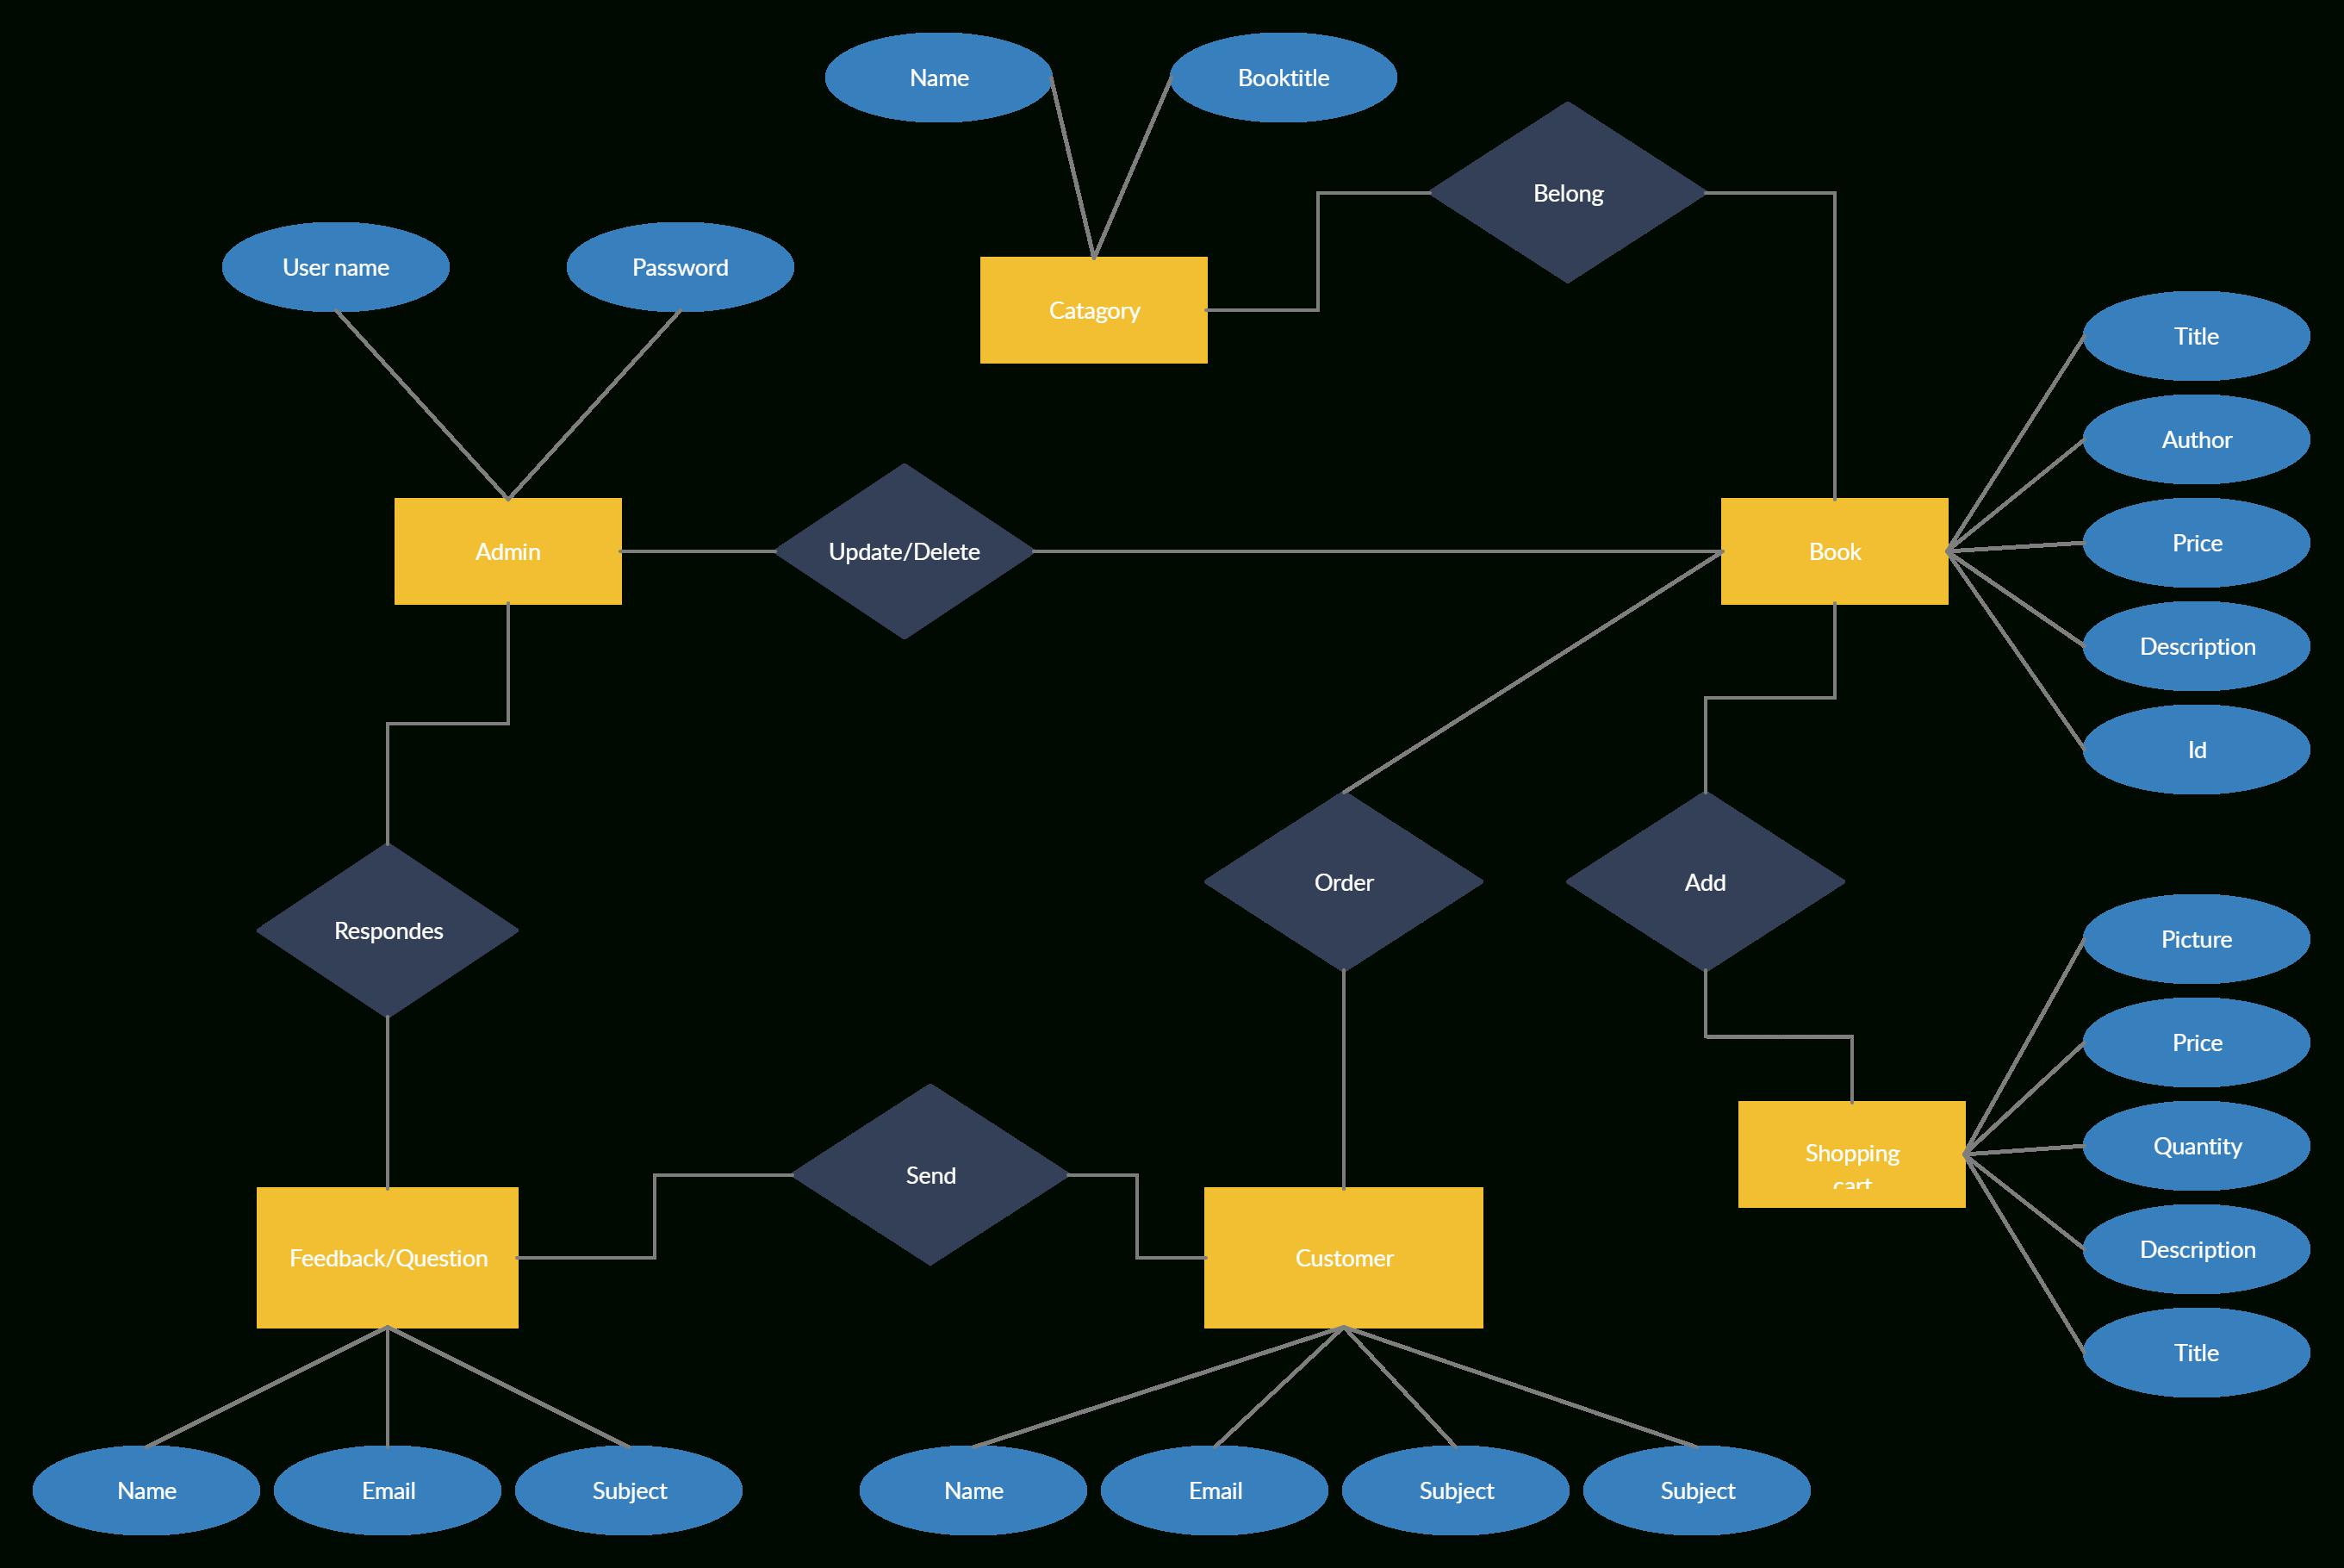 Online Bookstore | Relationship Diagram, App Design Layout